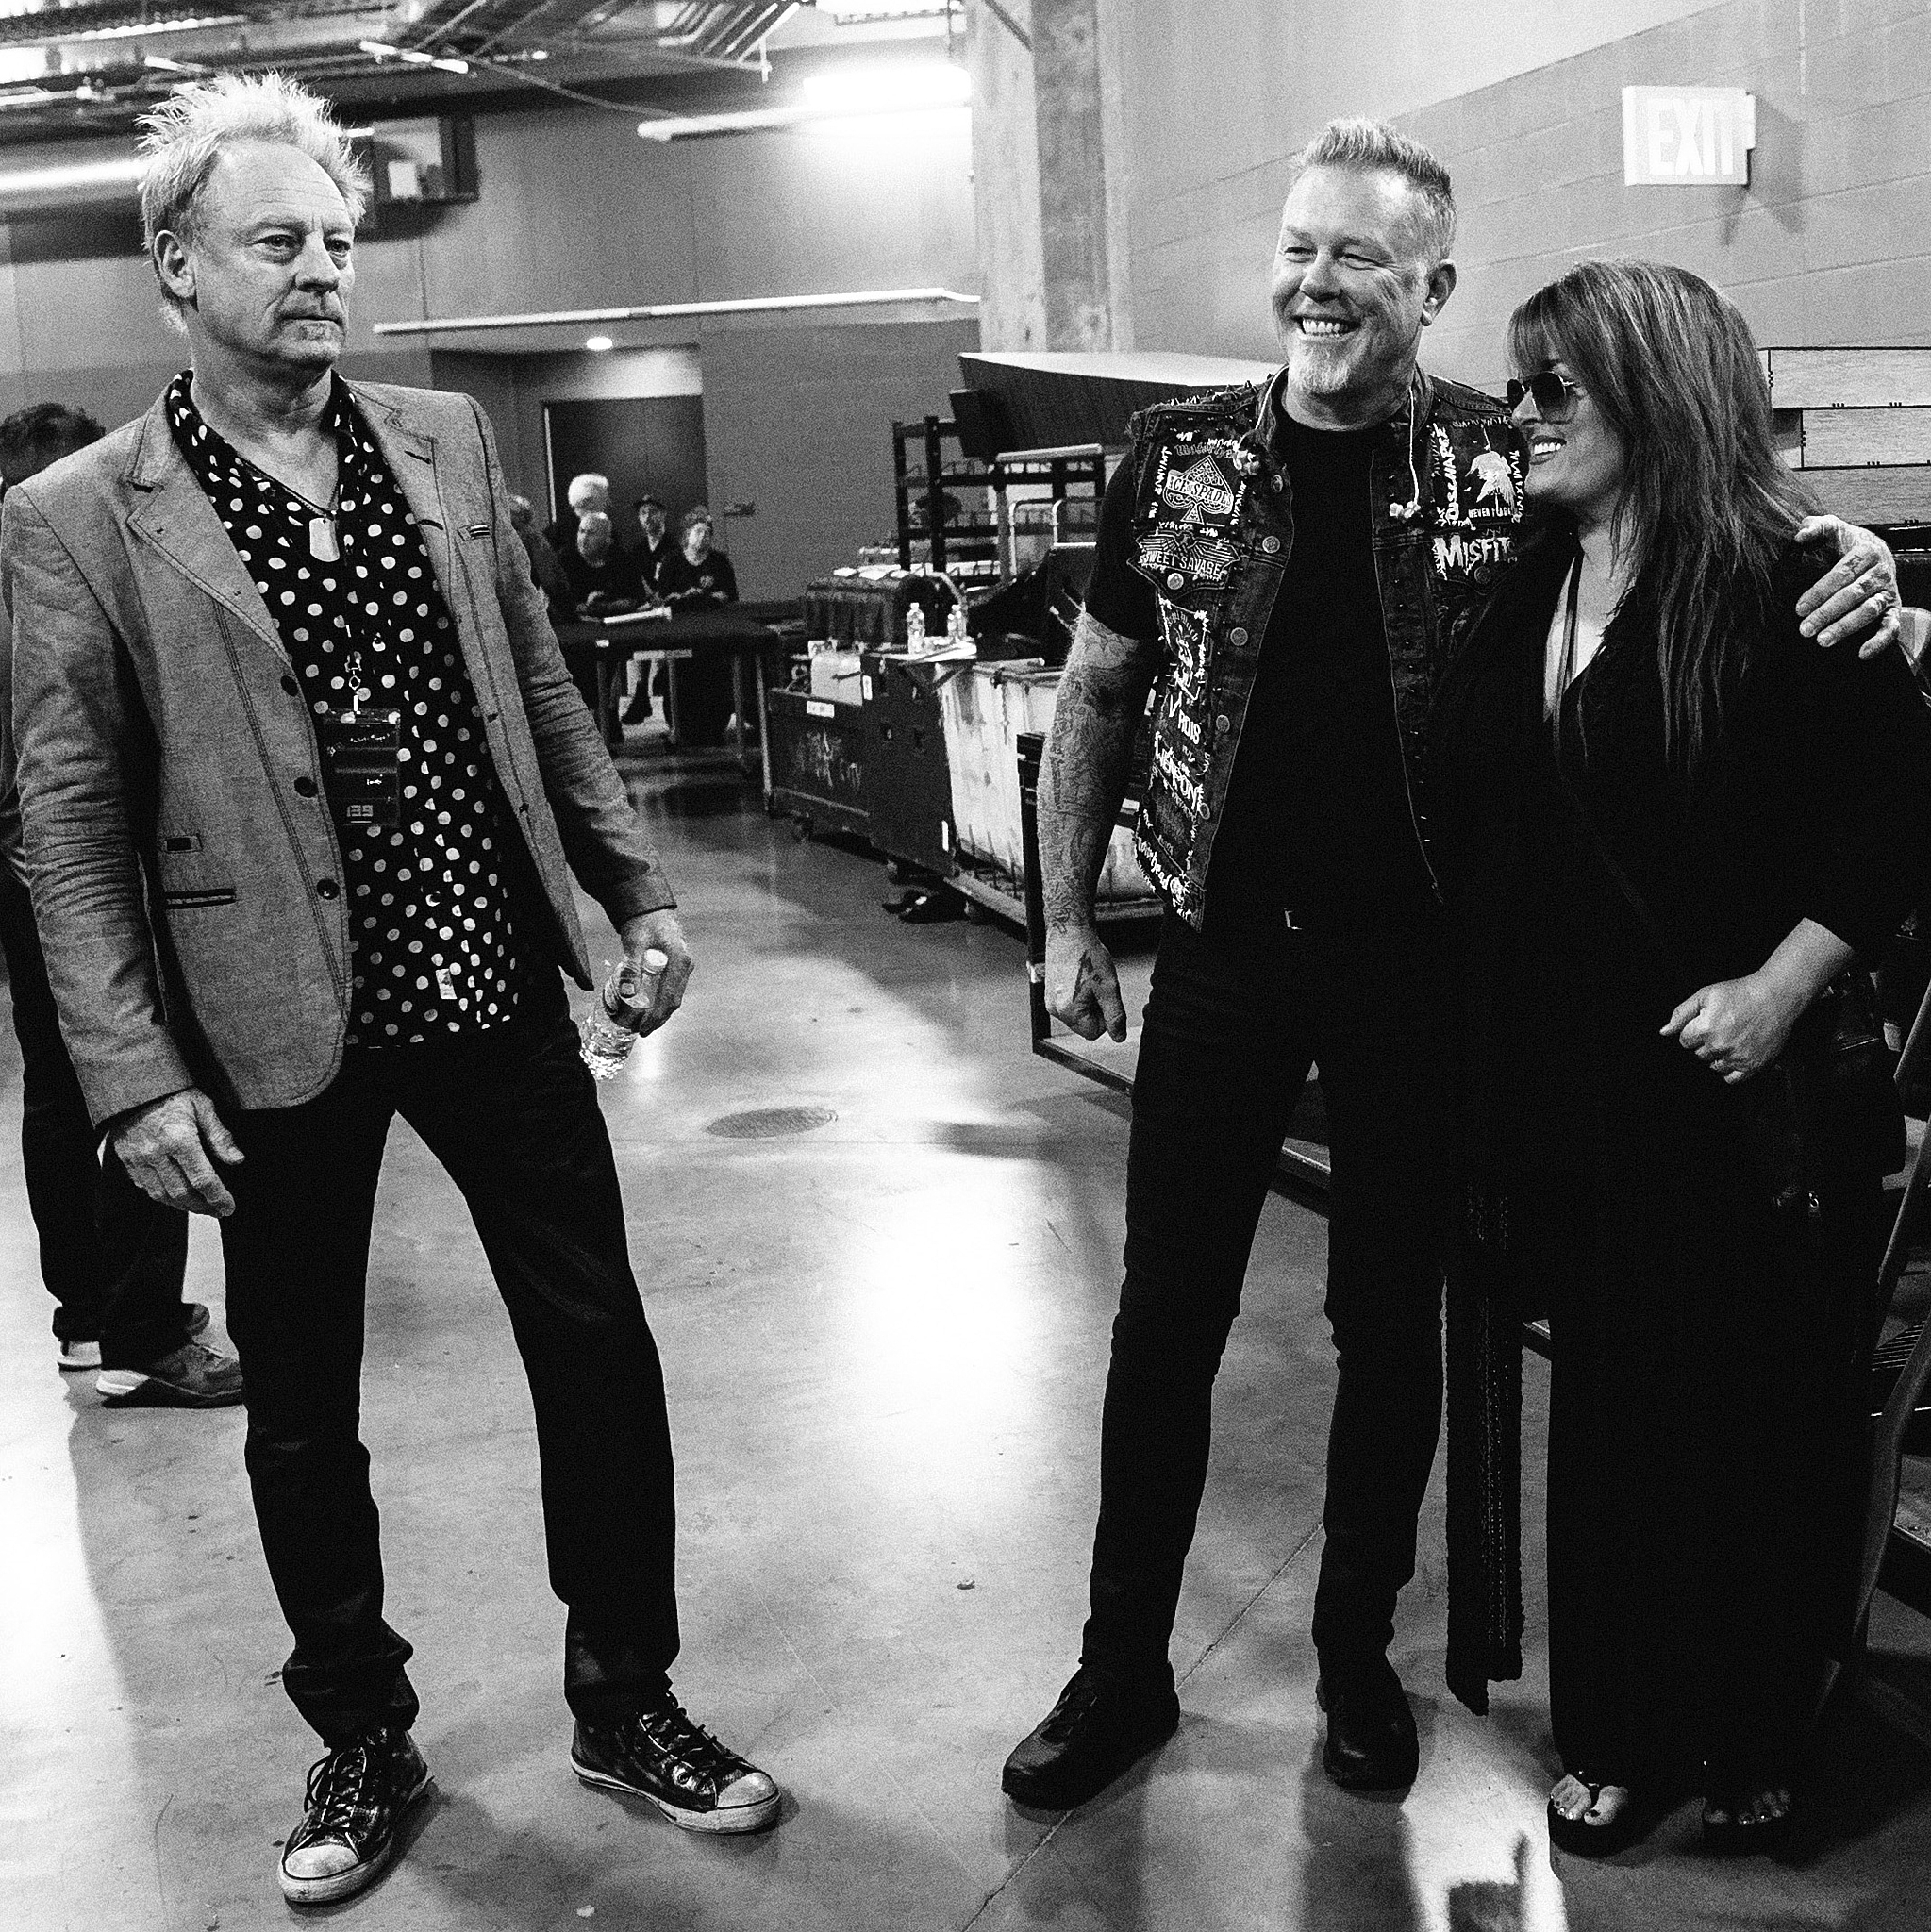 James_Hetfield_Wynonna_Cactus_US_Bank_Stadium_2016.jpg